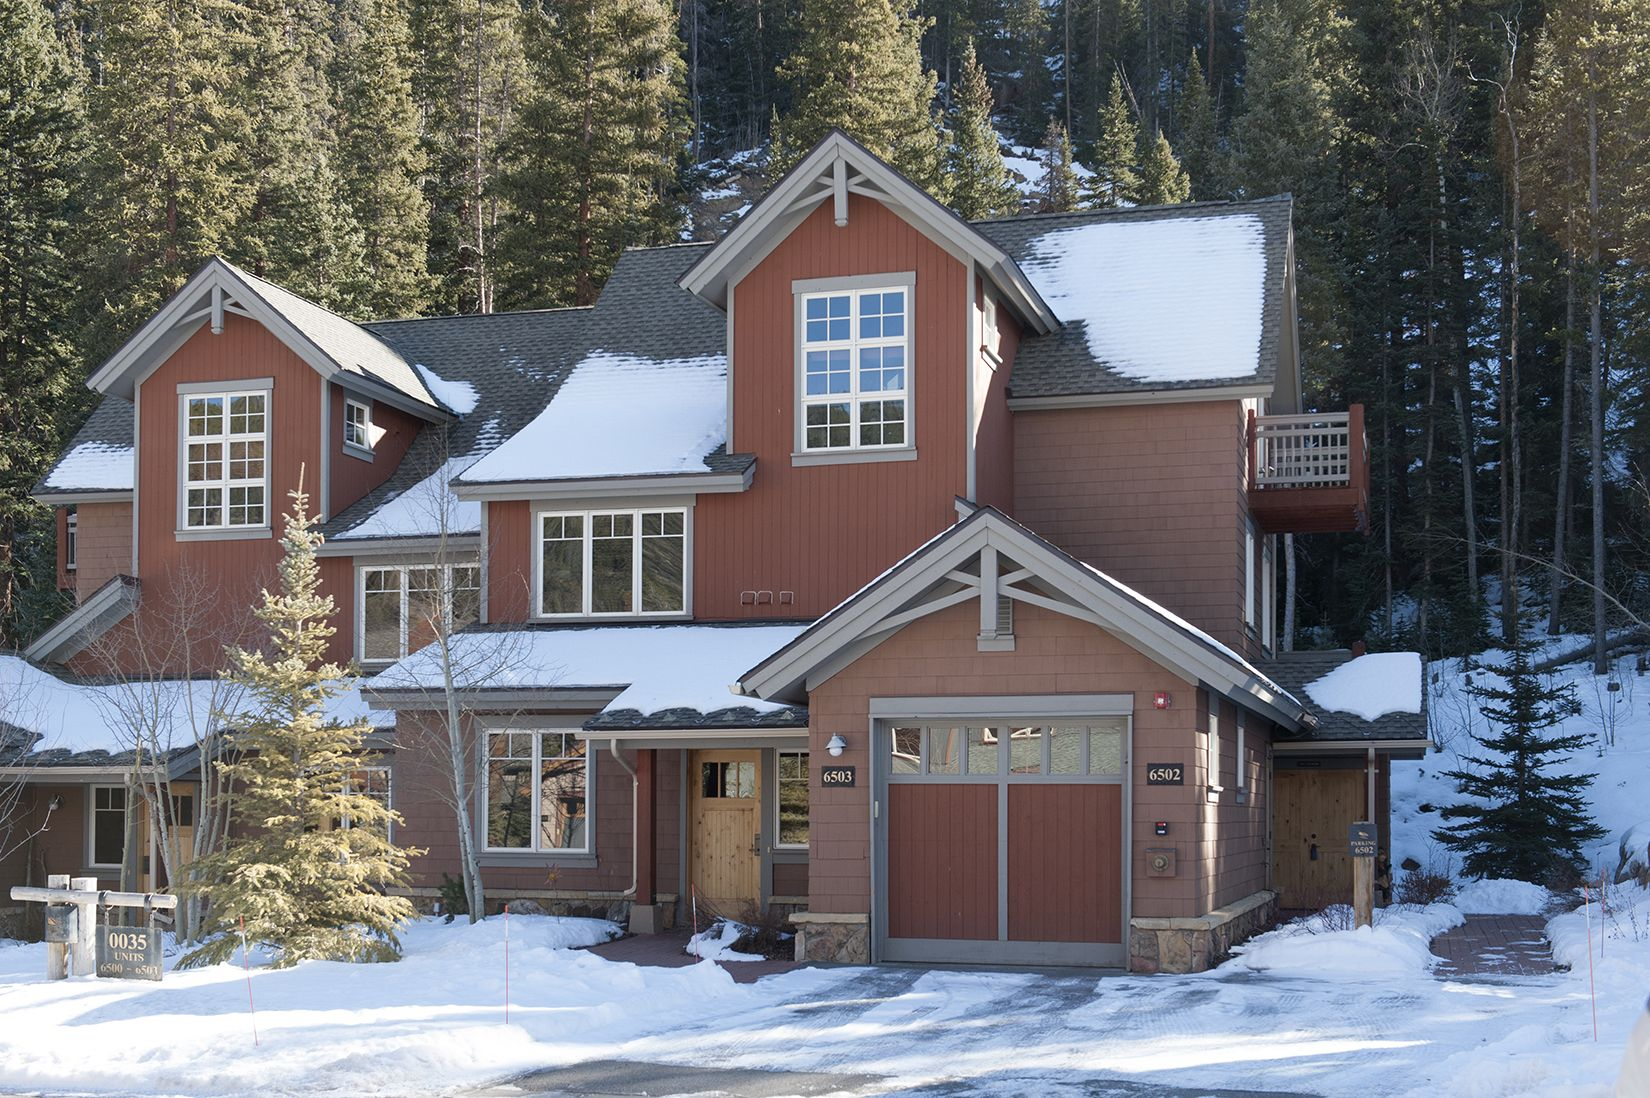 35 Tip Top TRAIL # 6502 KEYSTONE, Colorado 80435